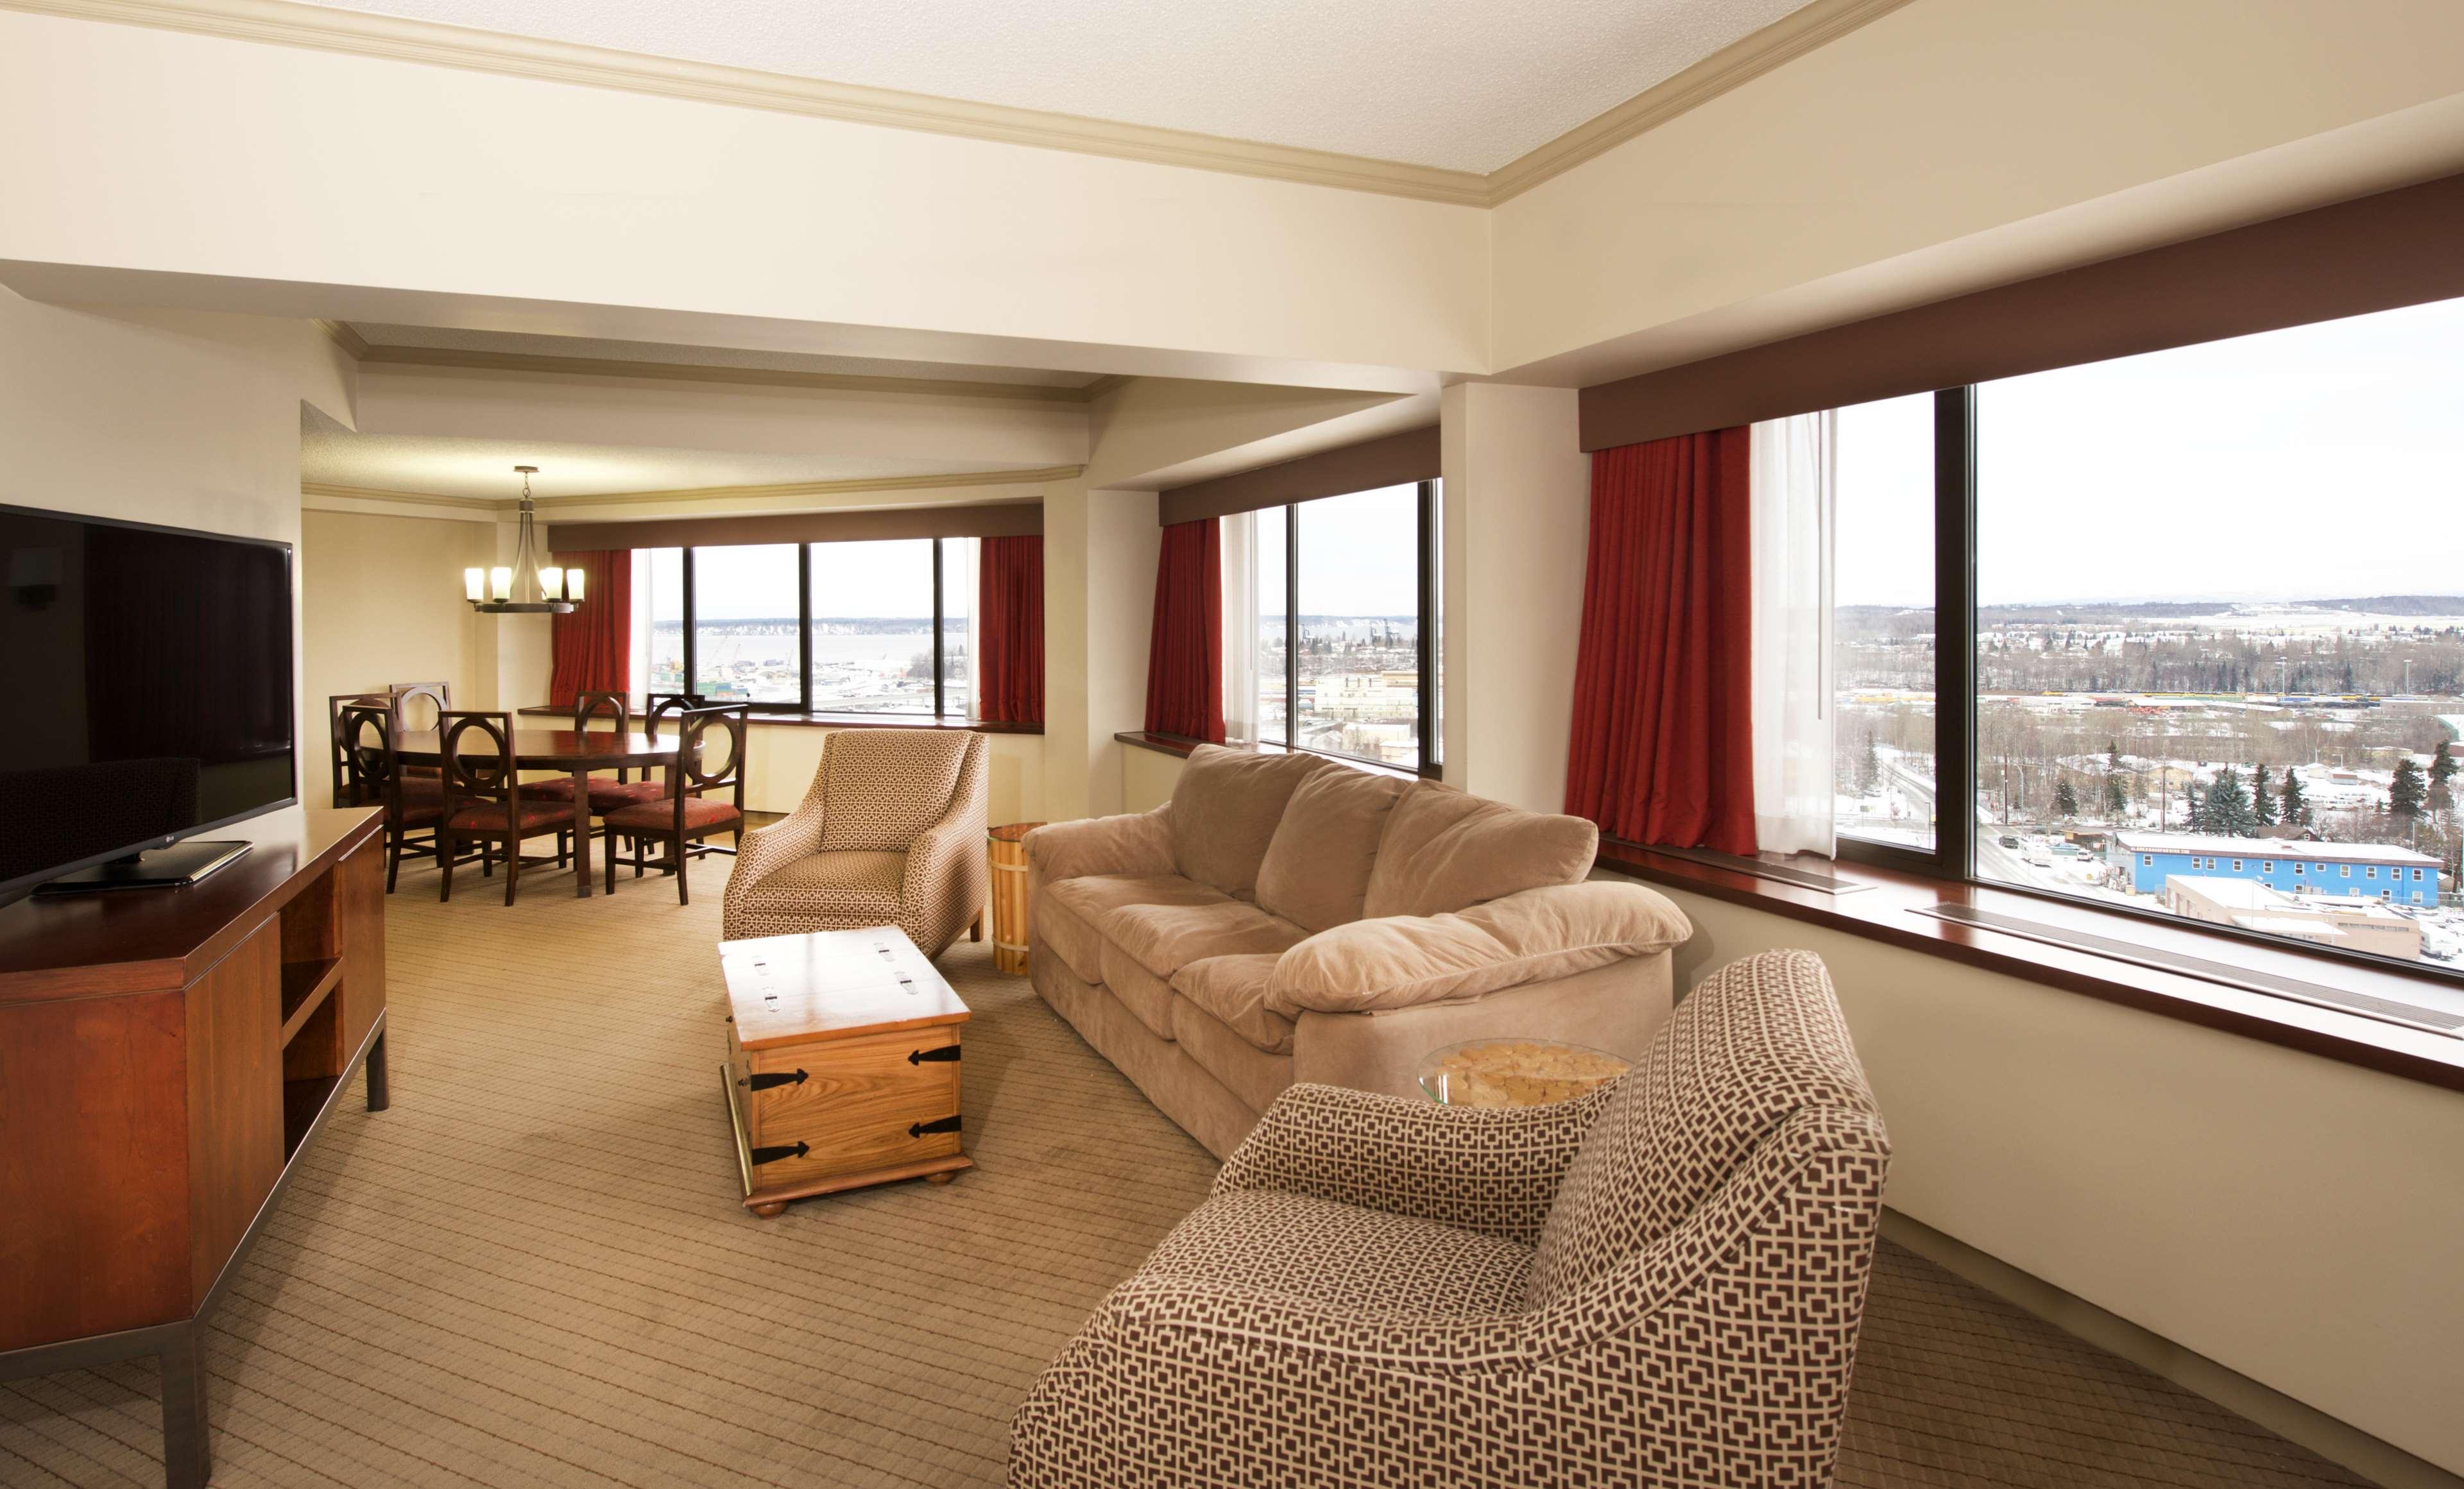 Sheraton Anchorage Hotel & Spa image 21